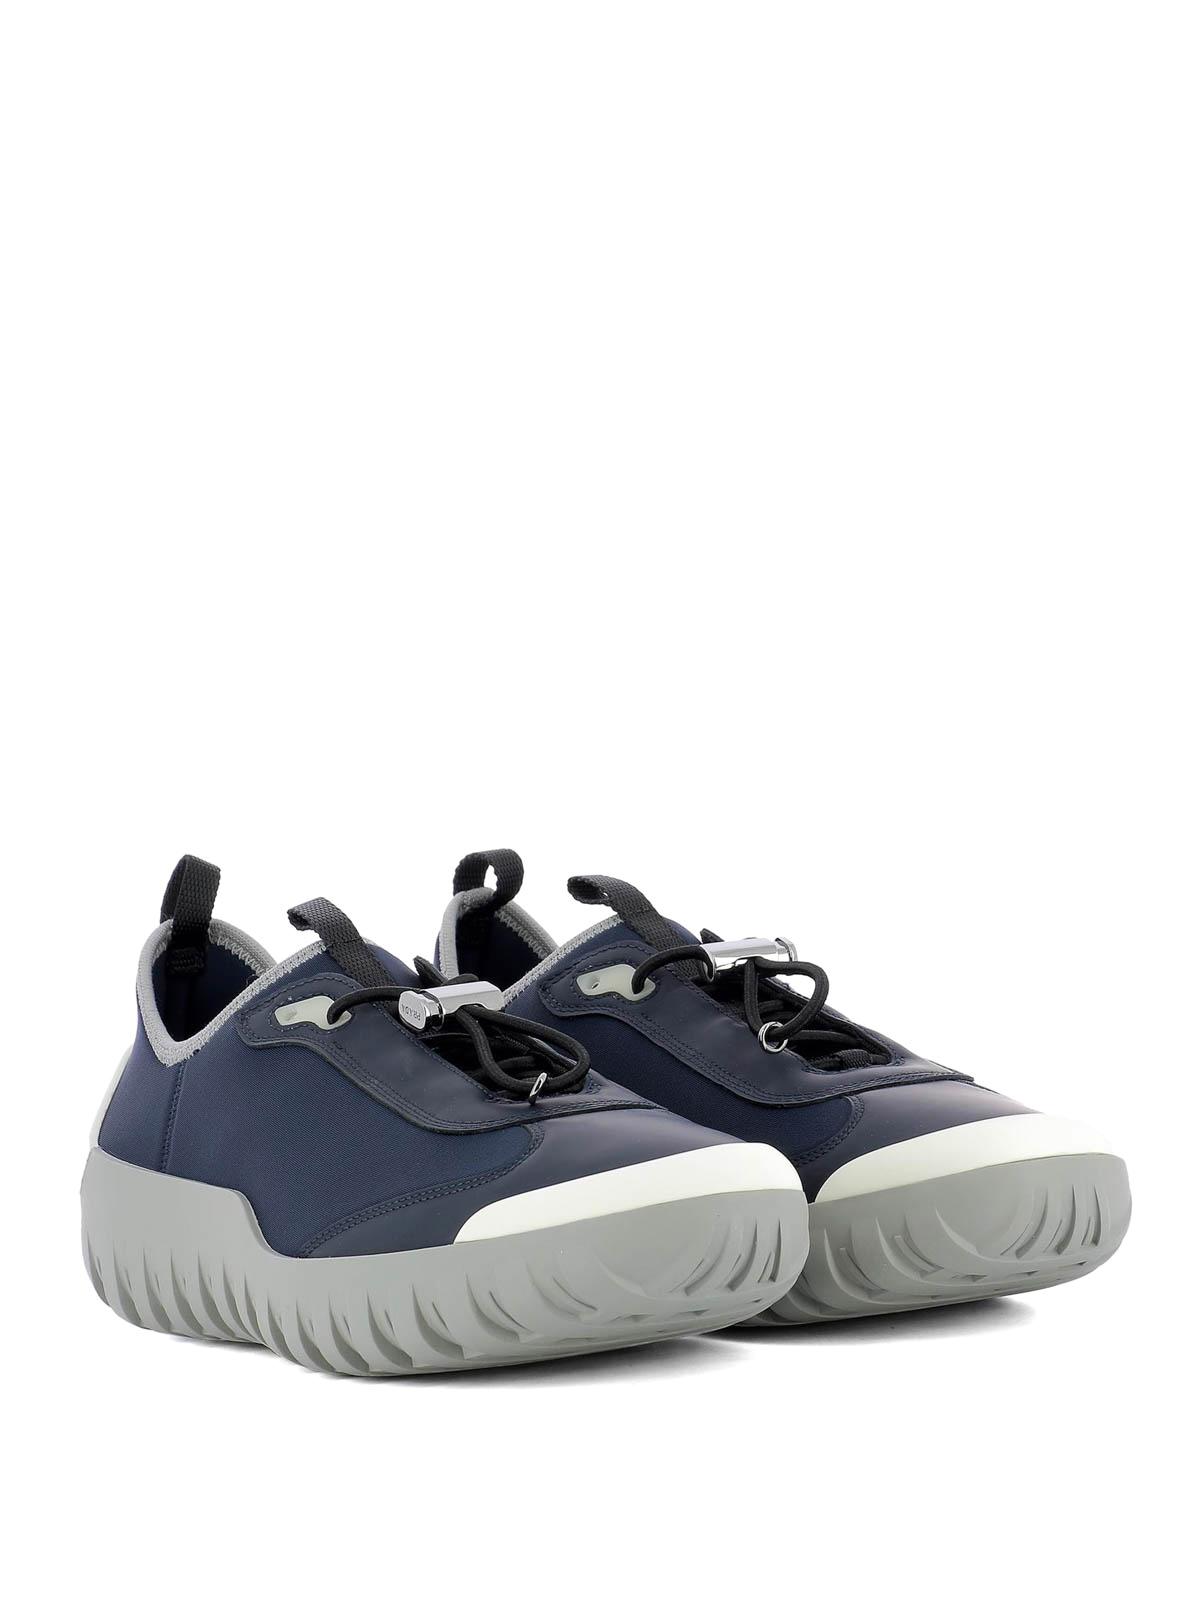 Prada neoprene sock sneakers sale view footlocker finishline cheap high quality lfUC6W